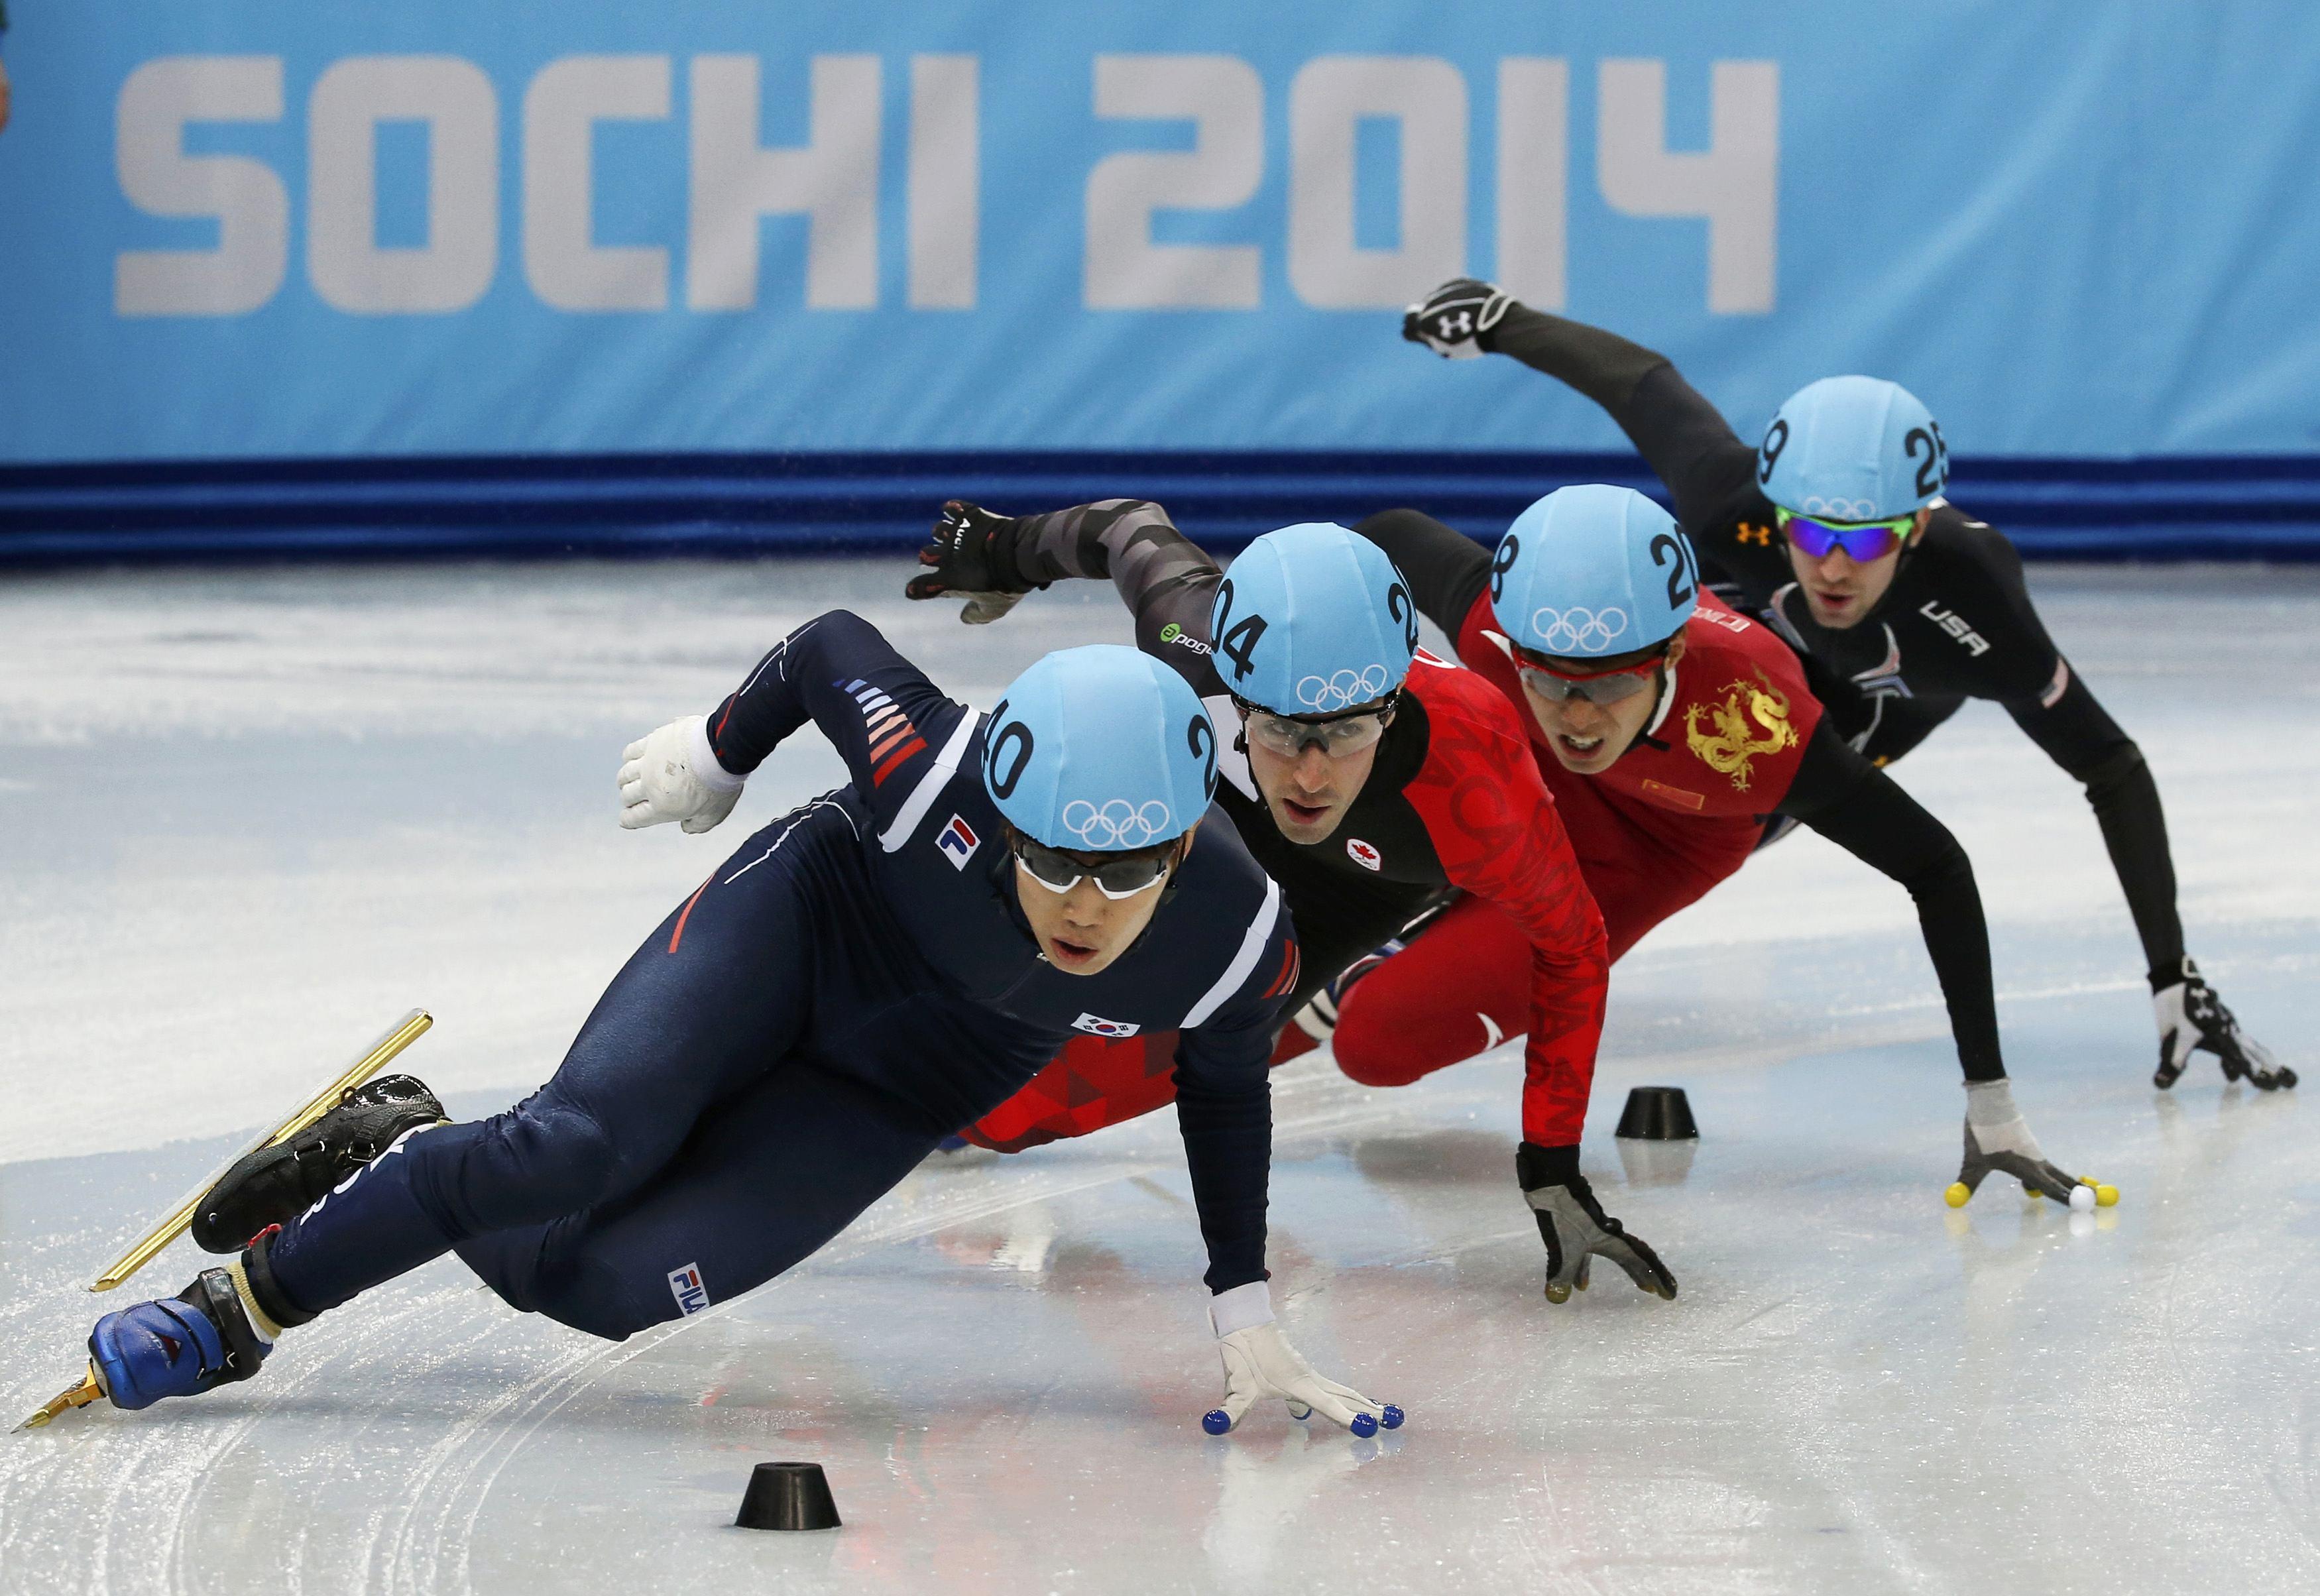 Sochi Olympics Day 5 Mancuso Wins Skiing Bronze Curling